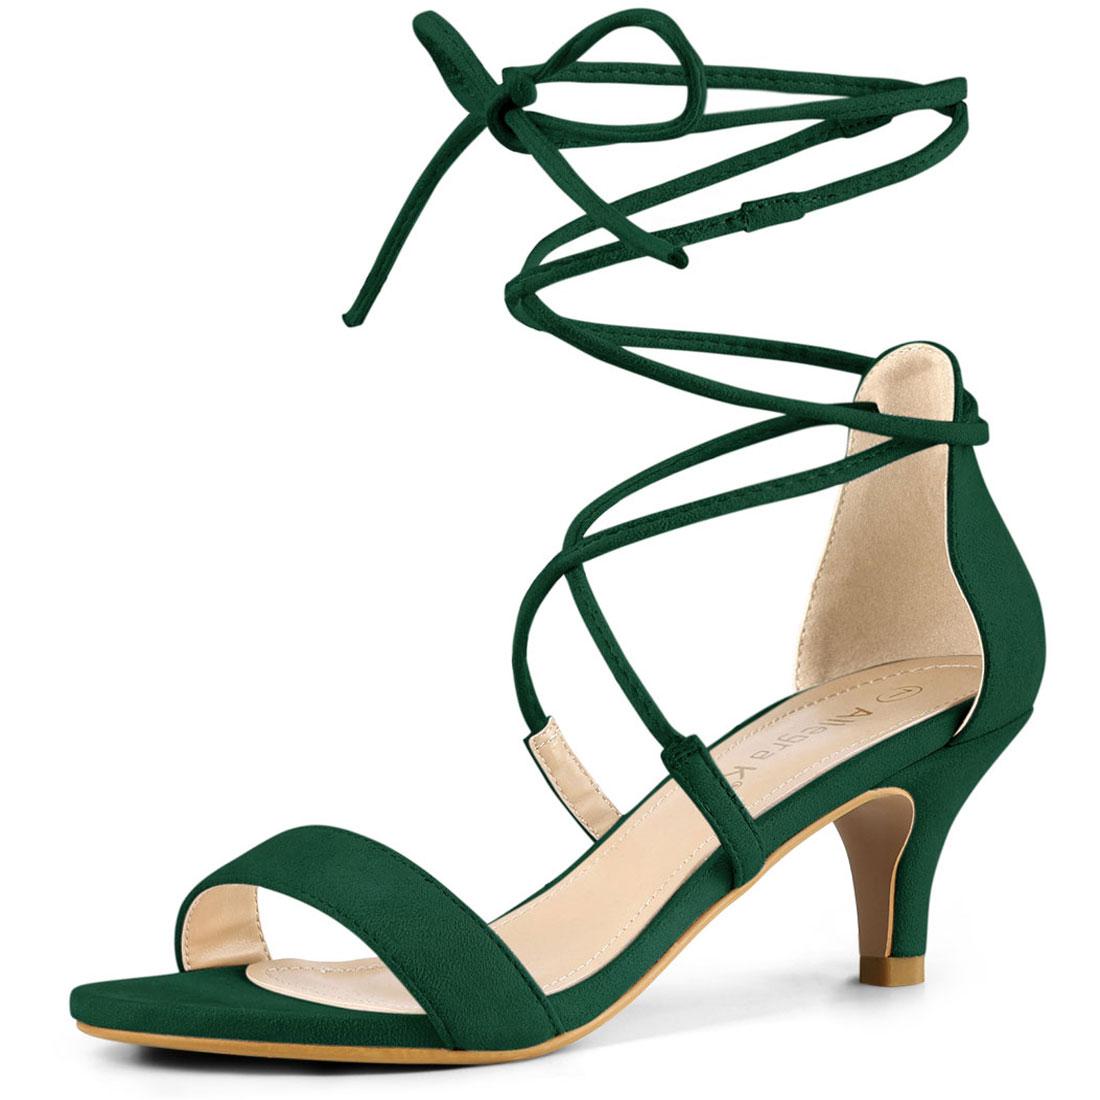 Allegra K Women's Kitten Heel Lace Up Open Toe Sandals Green US 8